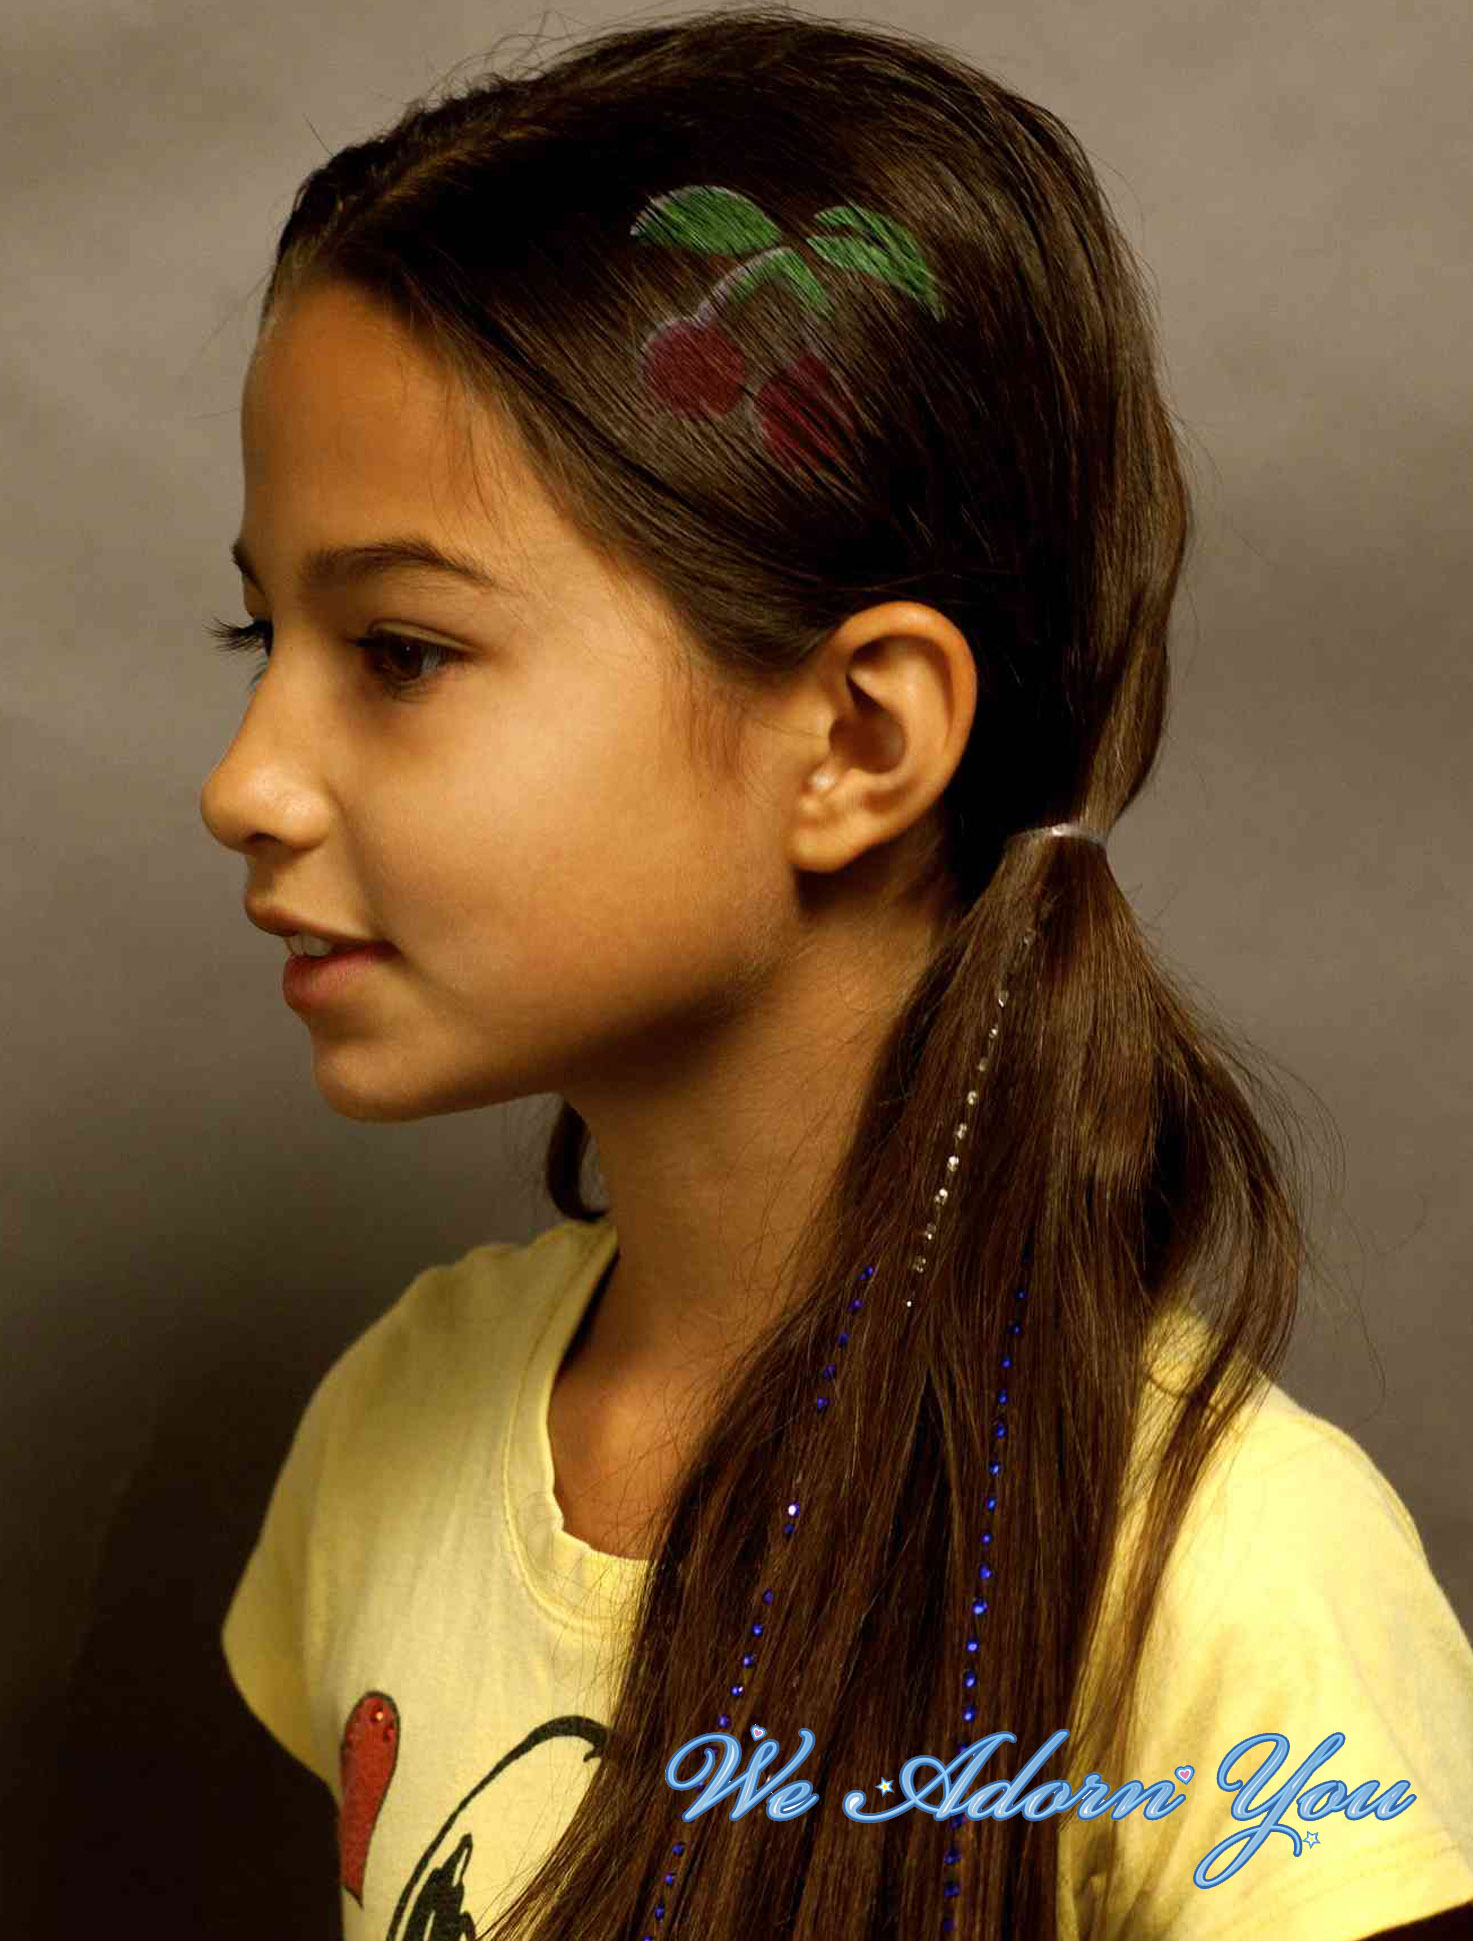 Hair Airbrush Cherries - We Adorn You.jpg